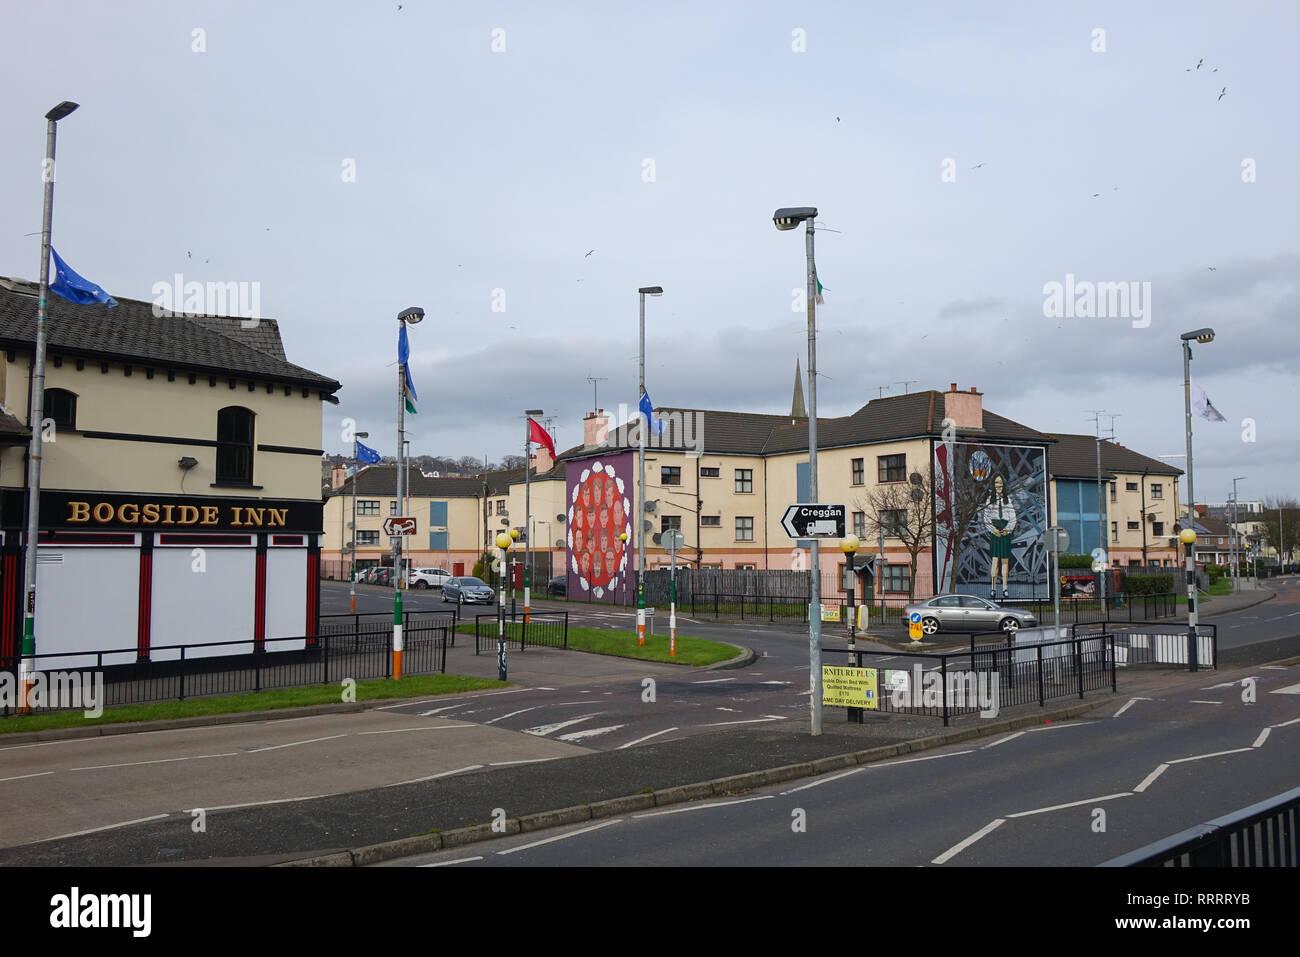 Bogside in Derry, Northern Ireland - Stock Image